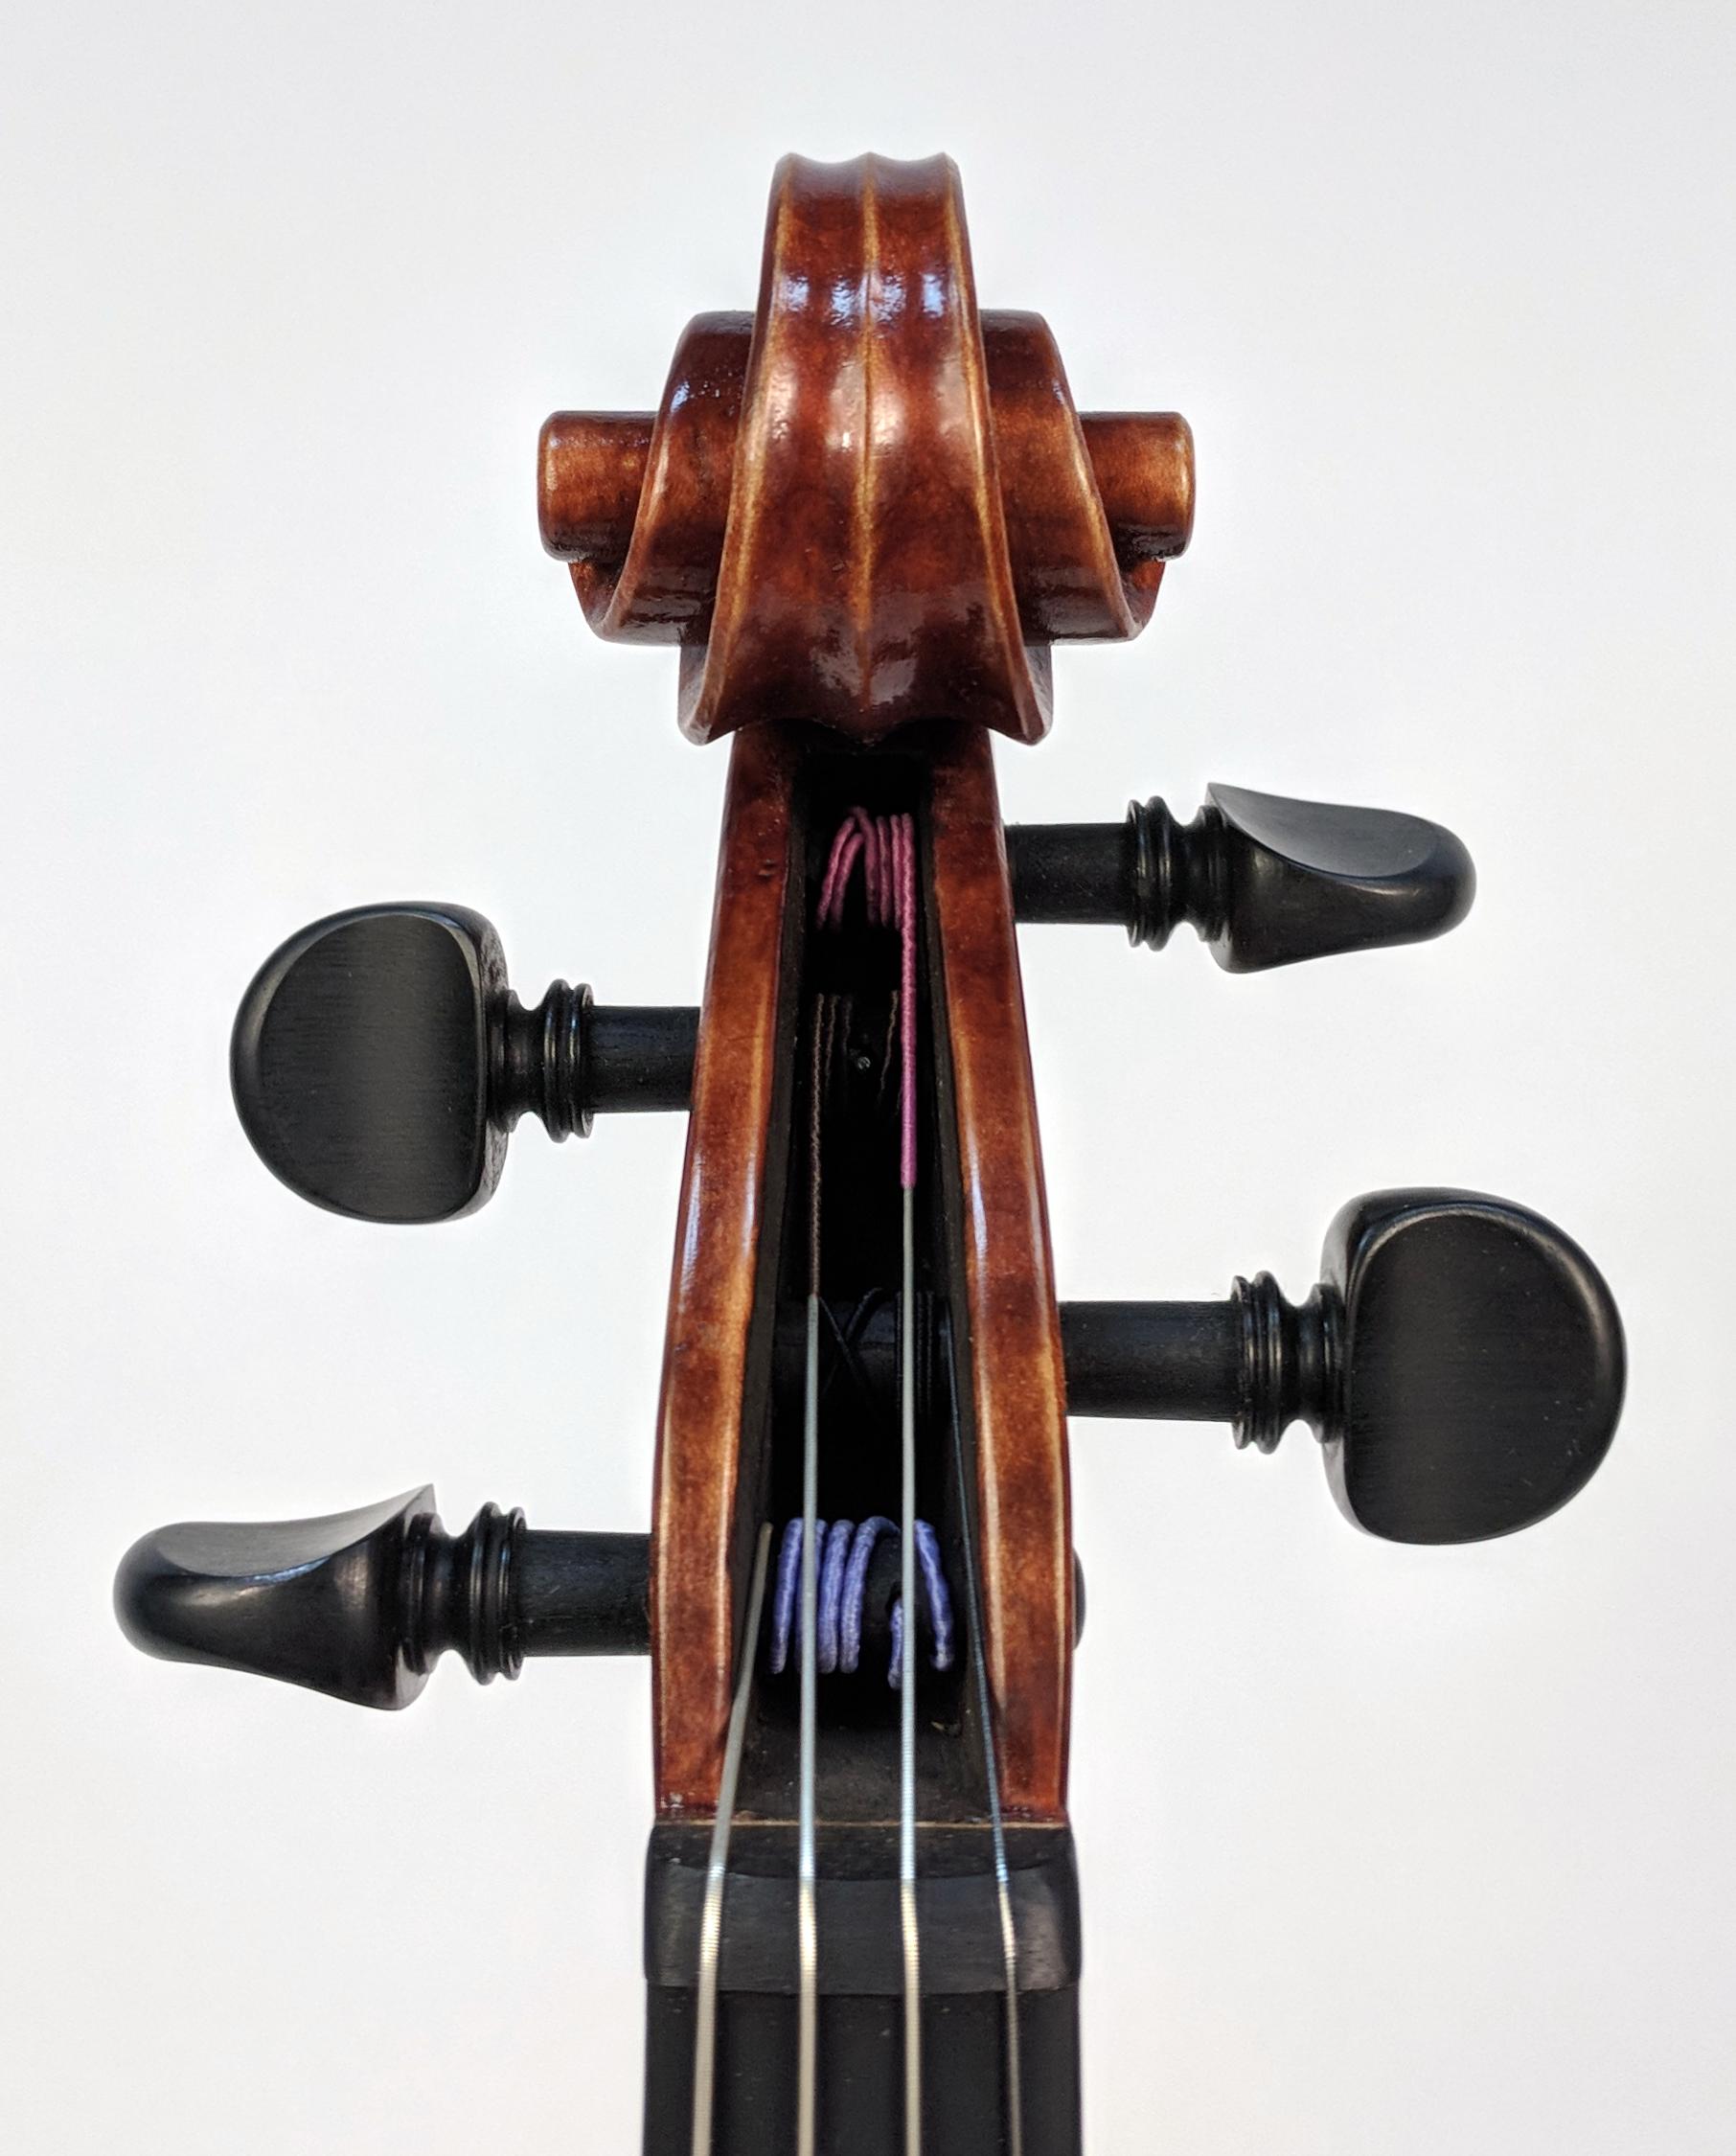 A. Corbishley, Oklahoma City OK 2016 Viola, Gofriller Model.